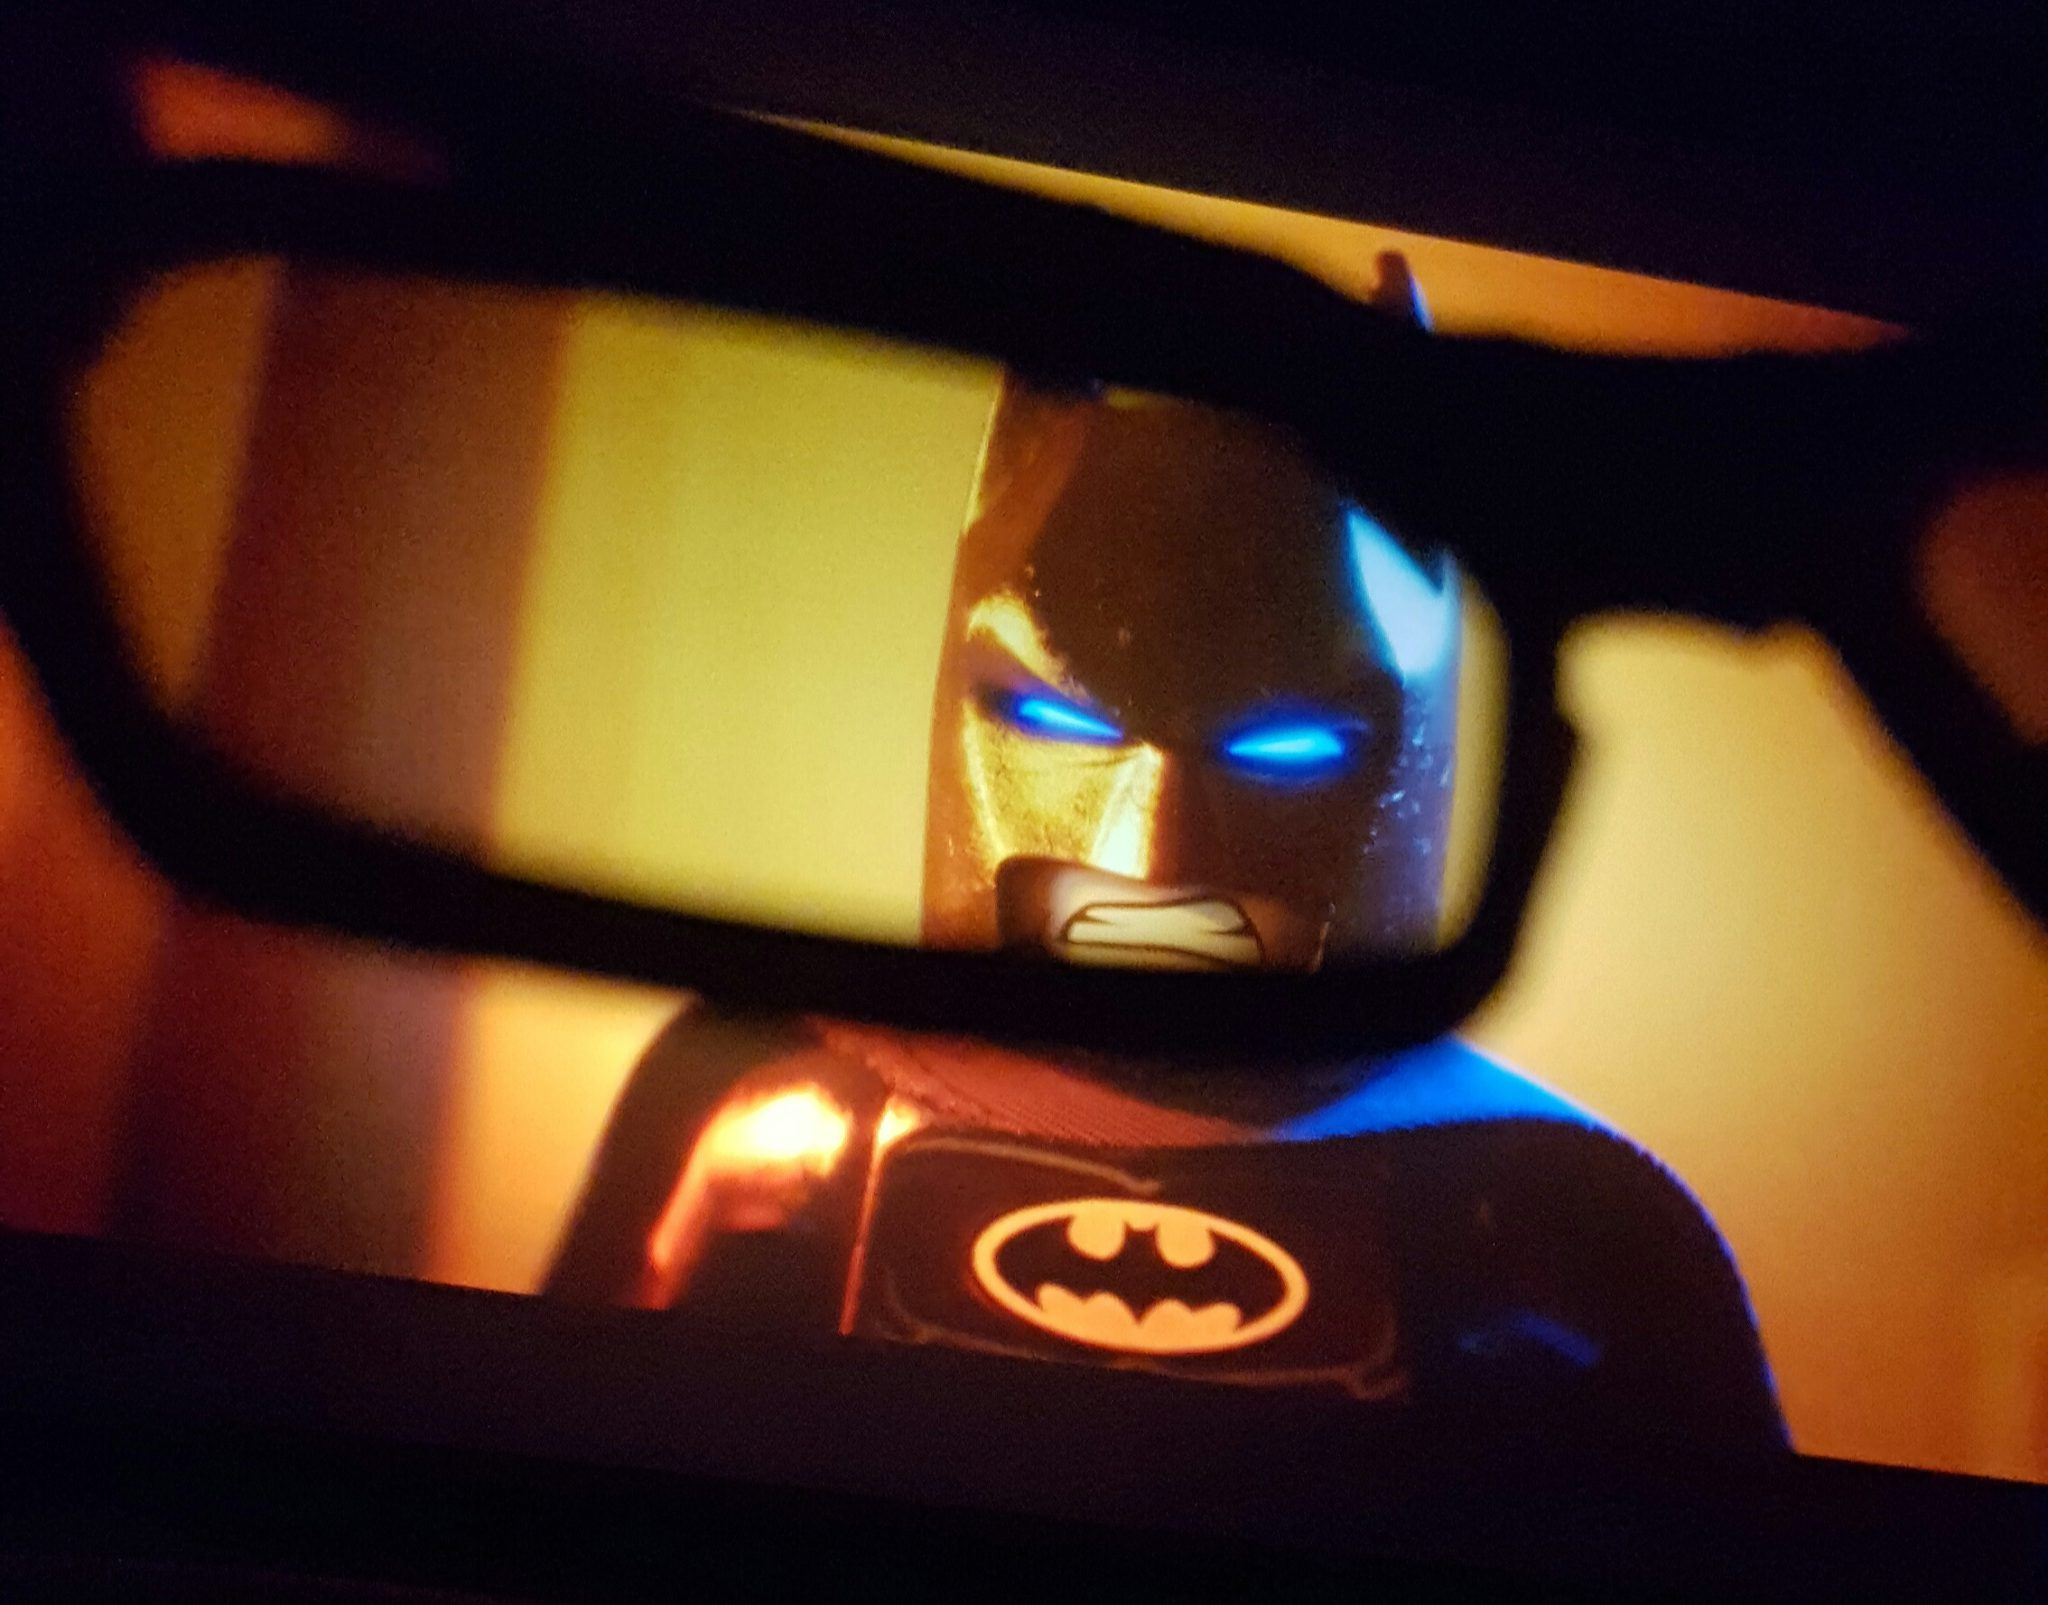 Batman versus Balerina.